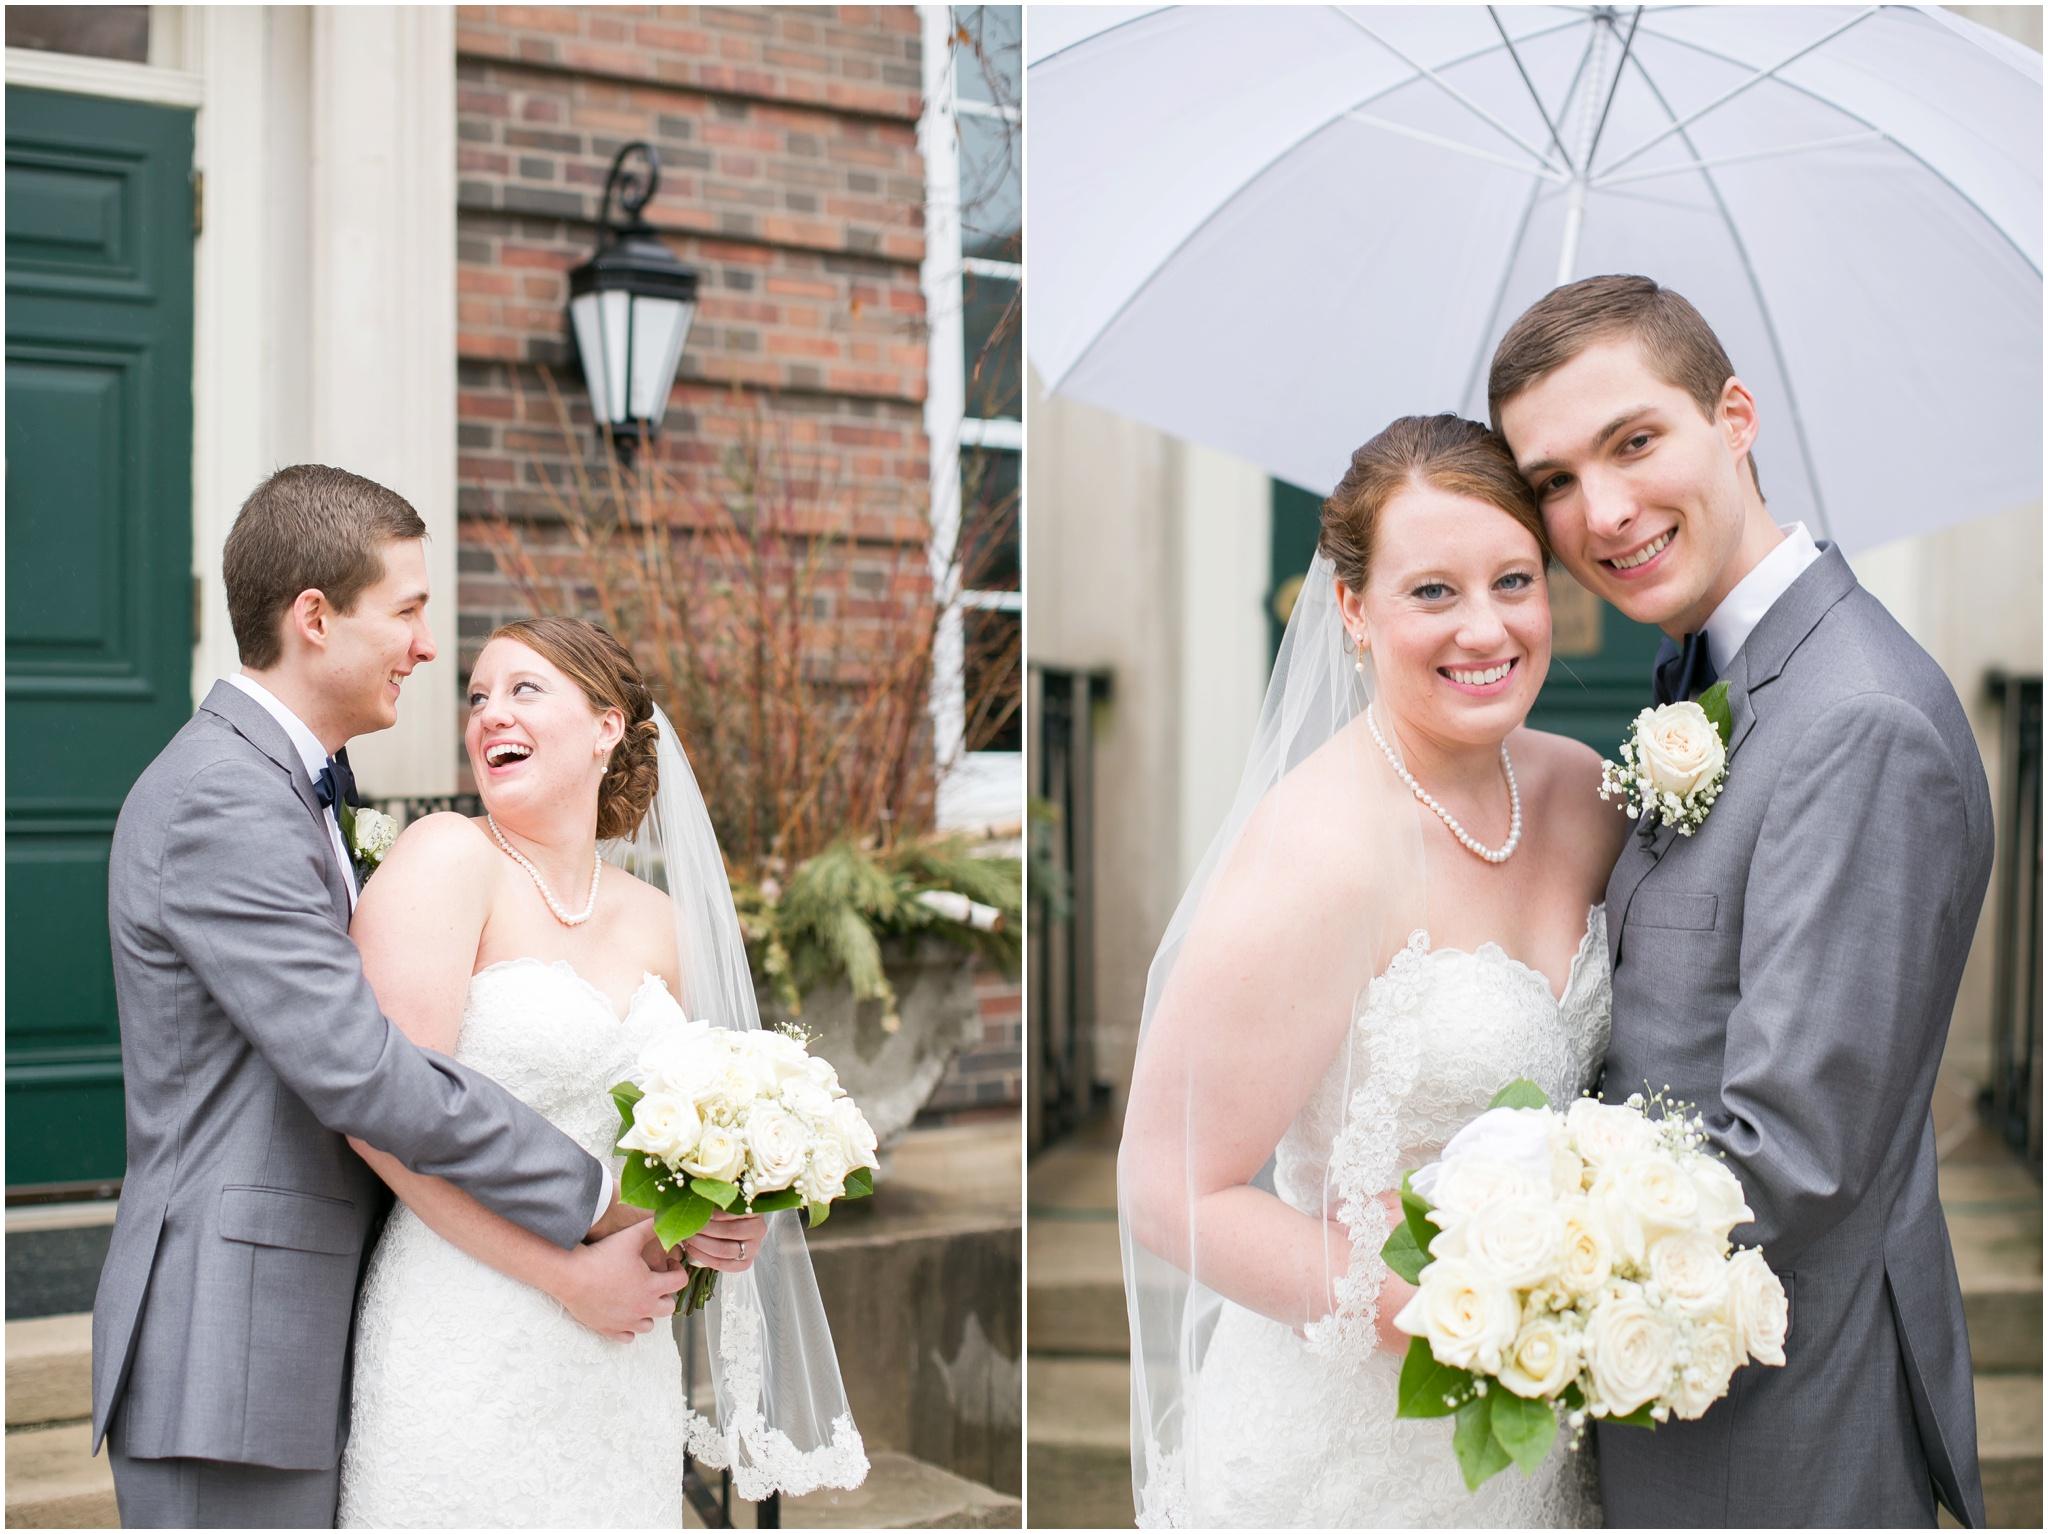 Madison_Club_Madison_Wisconsin_Wedding_Photographer_Spring_Rainy_Wedding_2630.jpg